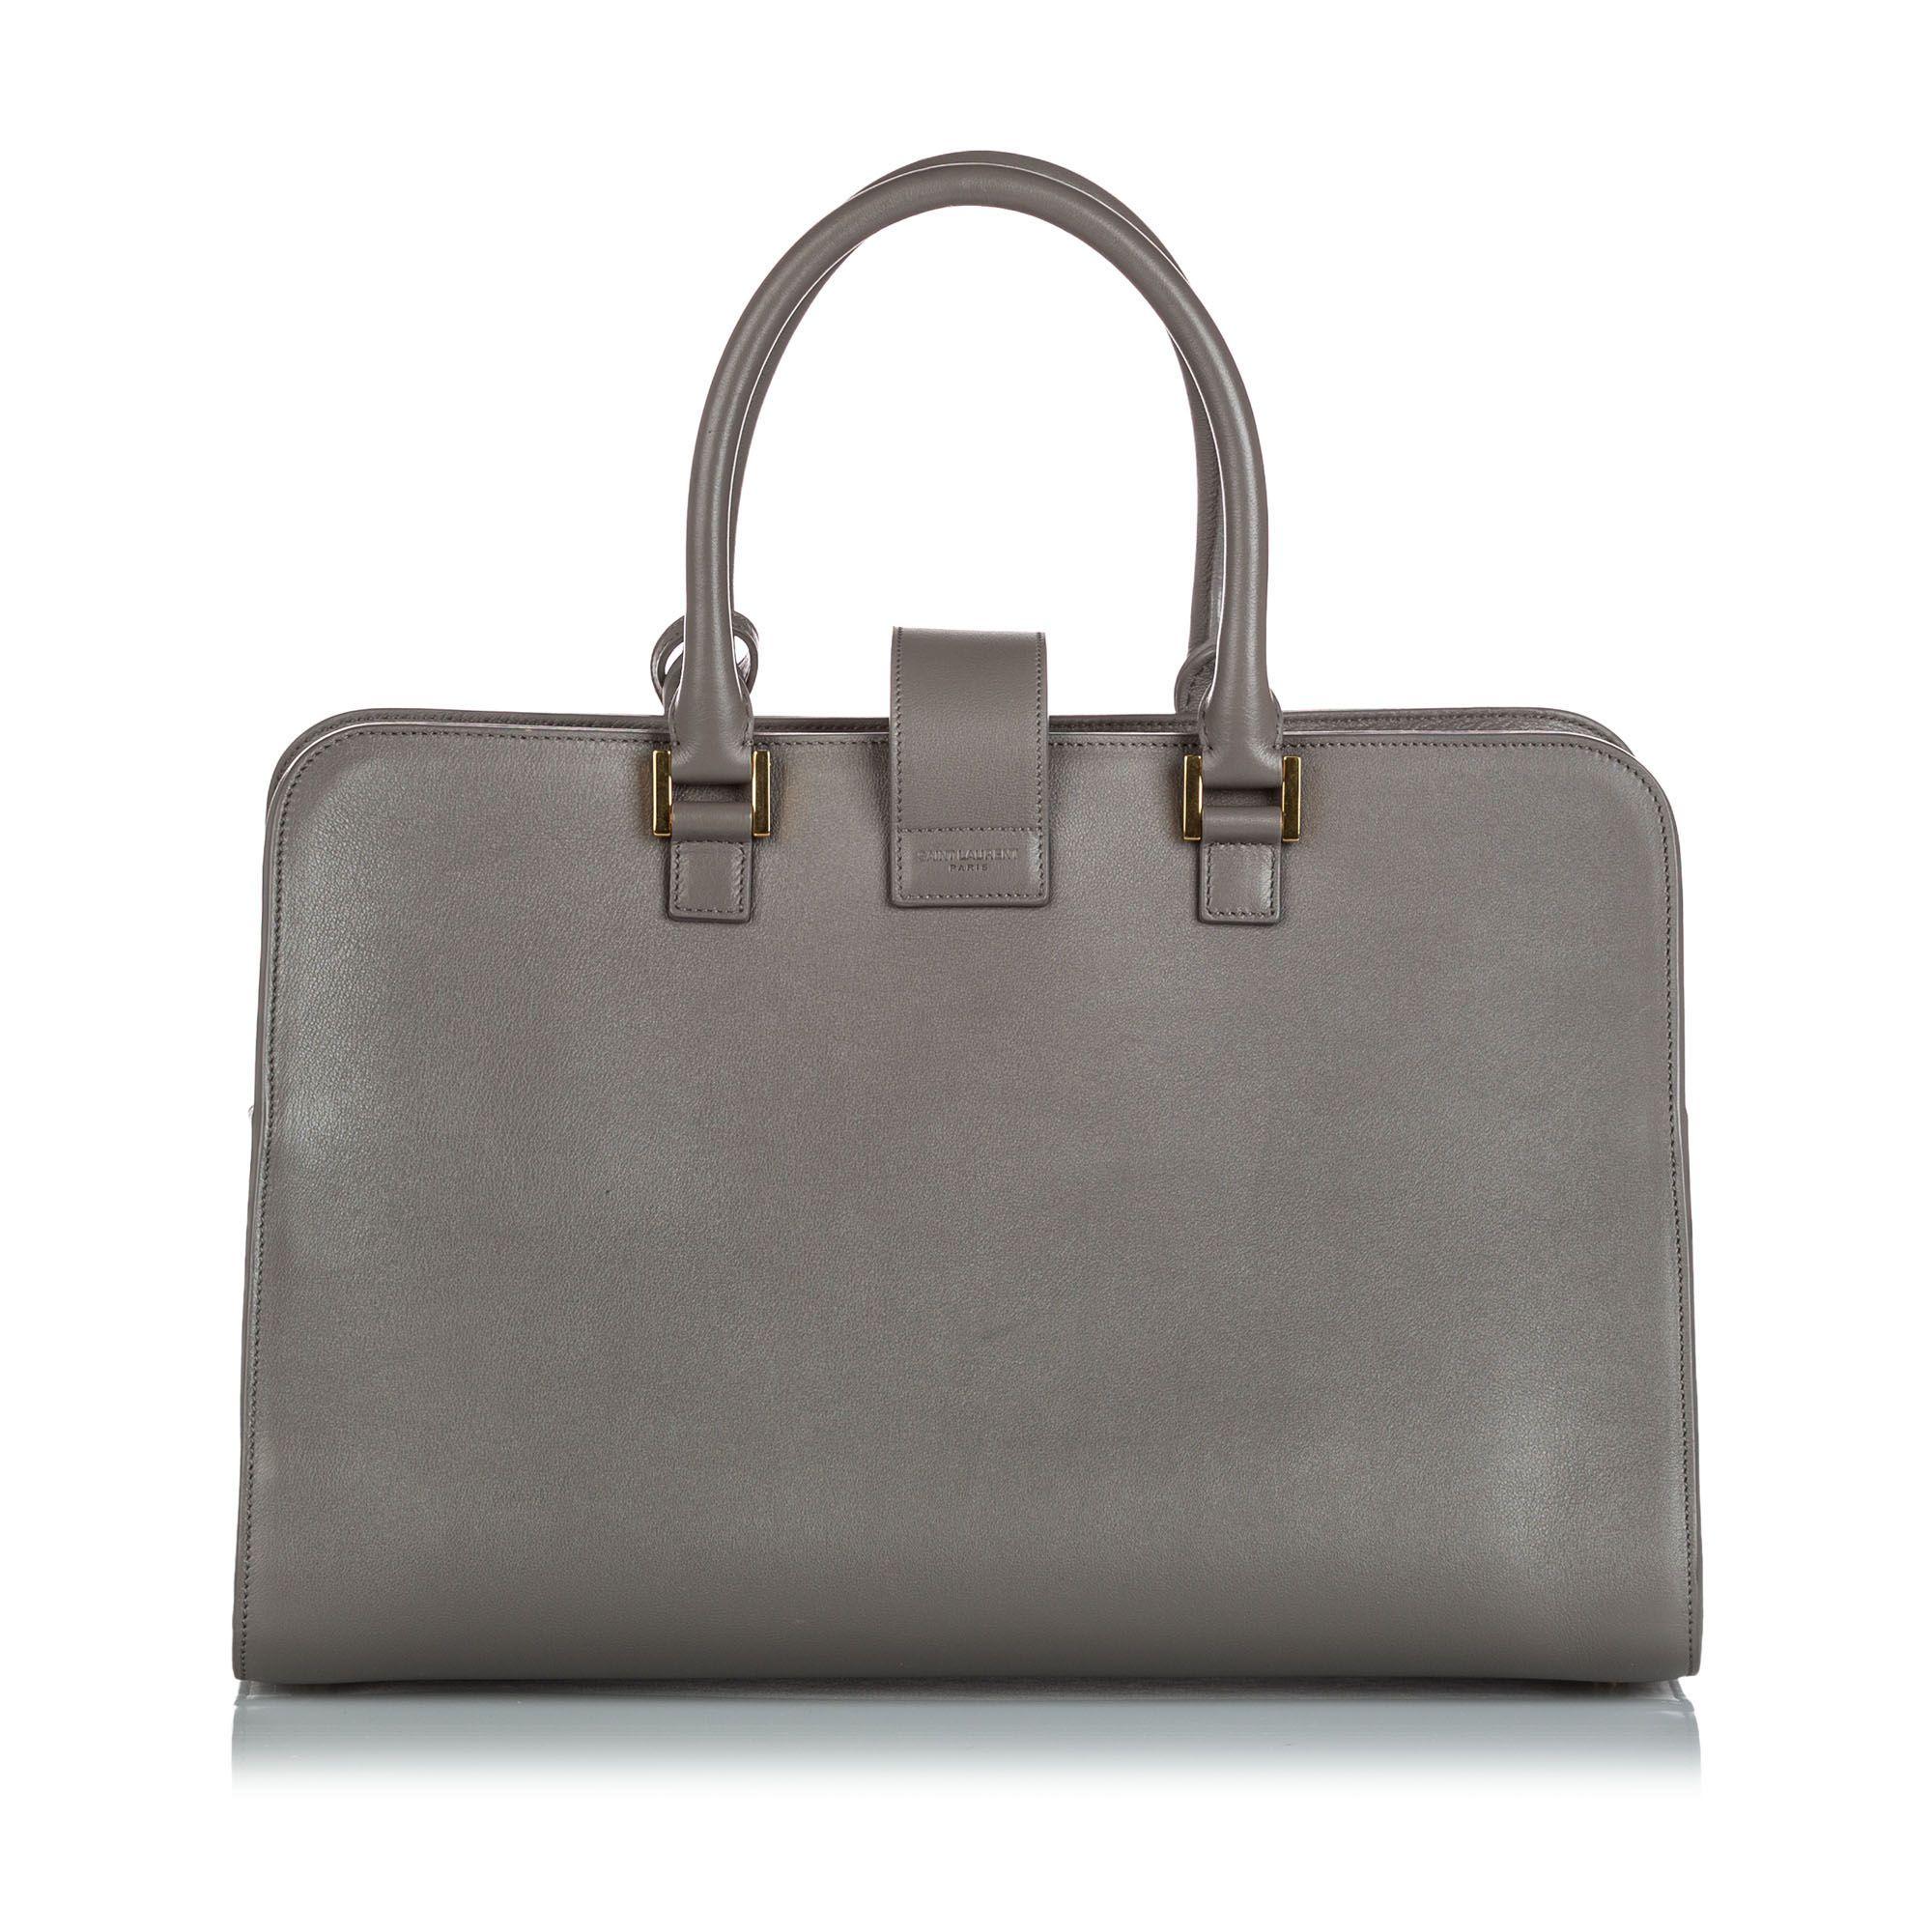 Vintage YSL Leather Monogram Cabas Satchel Gray